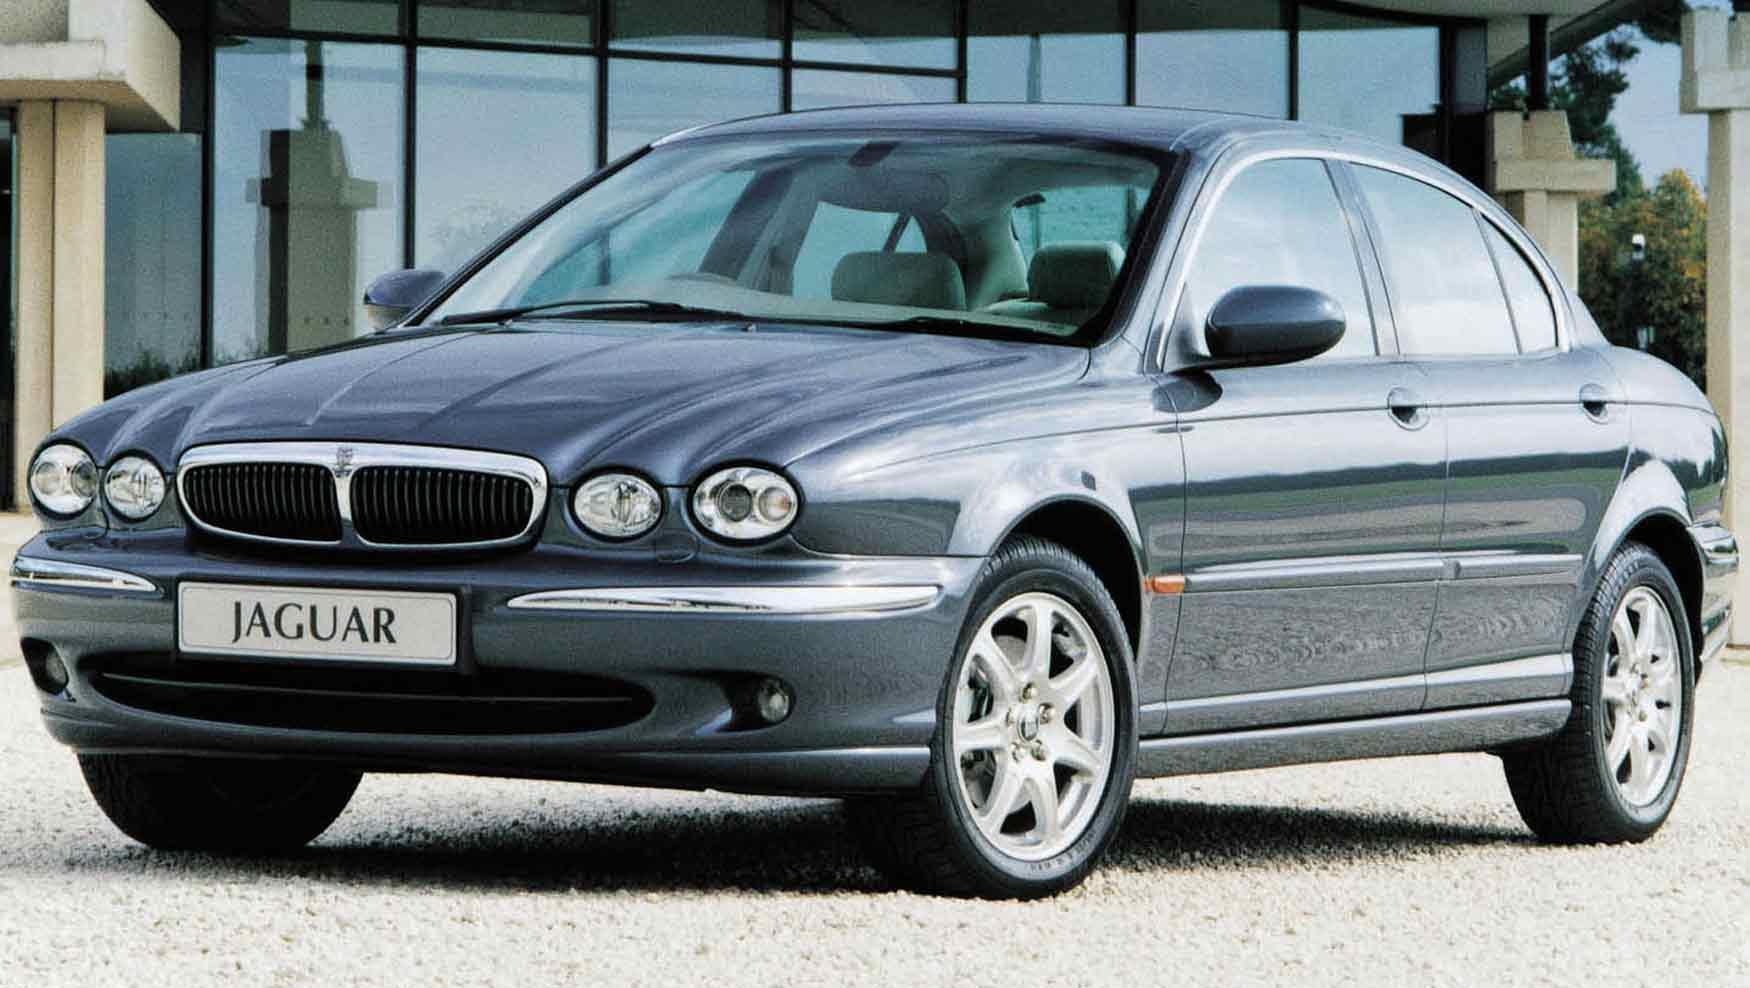 30+ Jaguar x type 2000 v6 inspirations